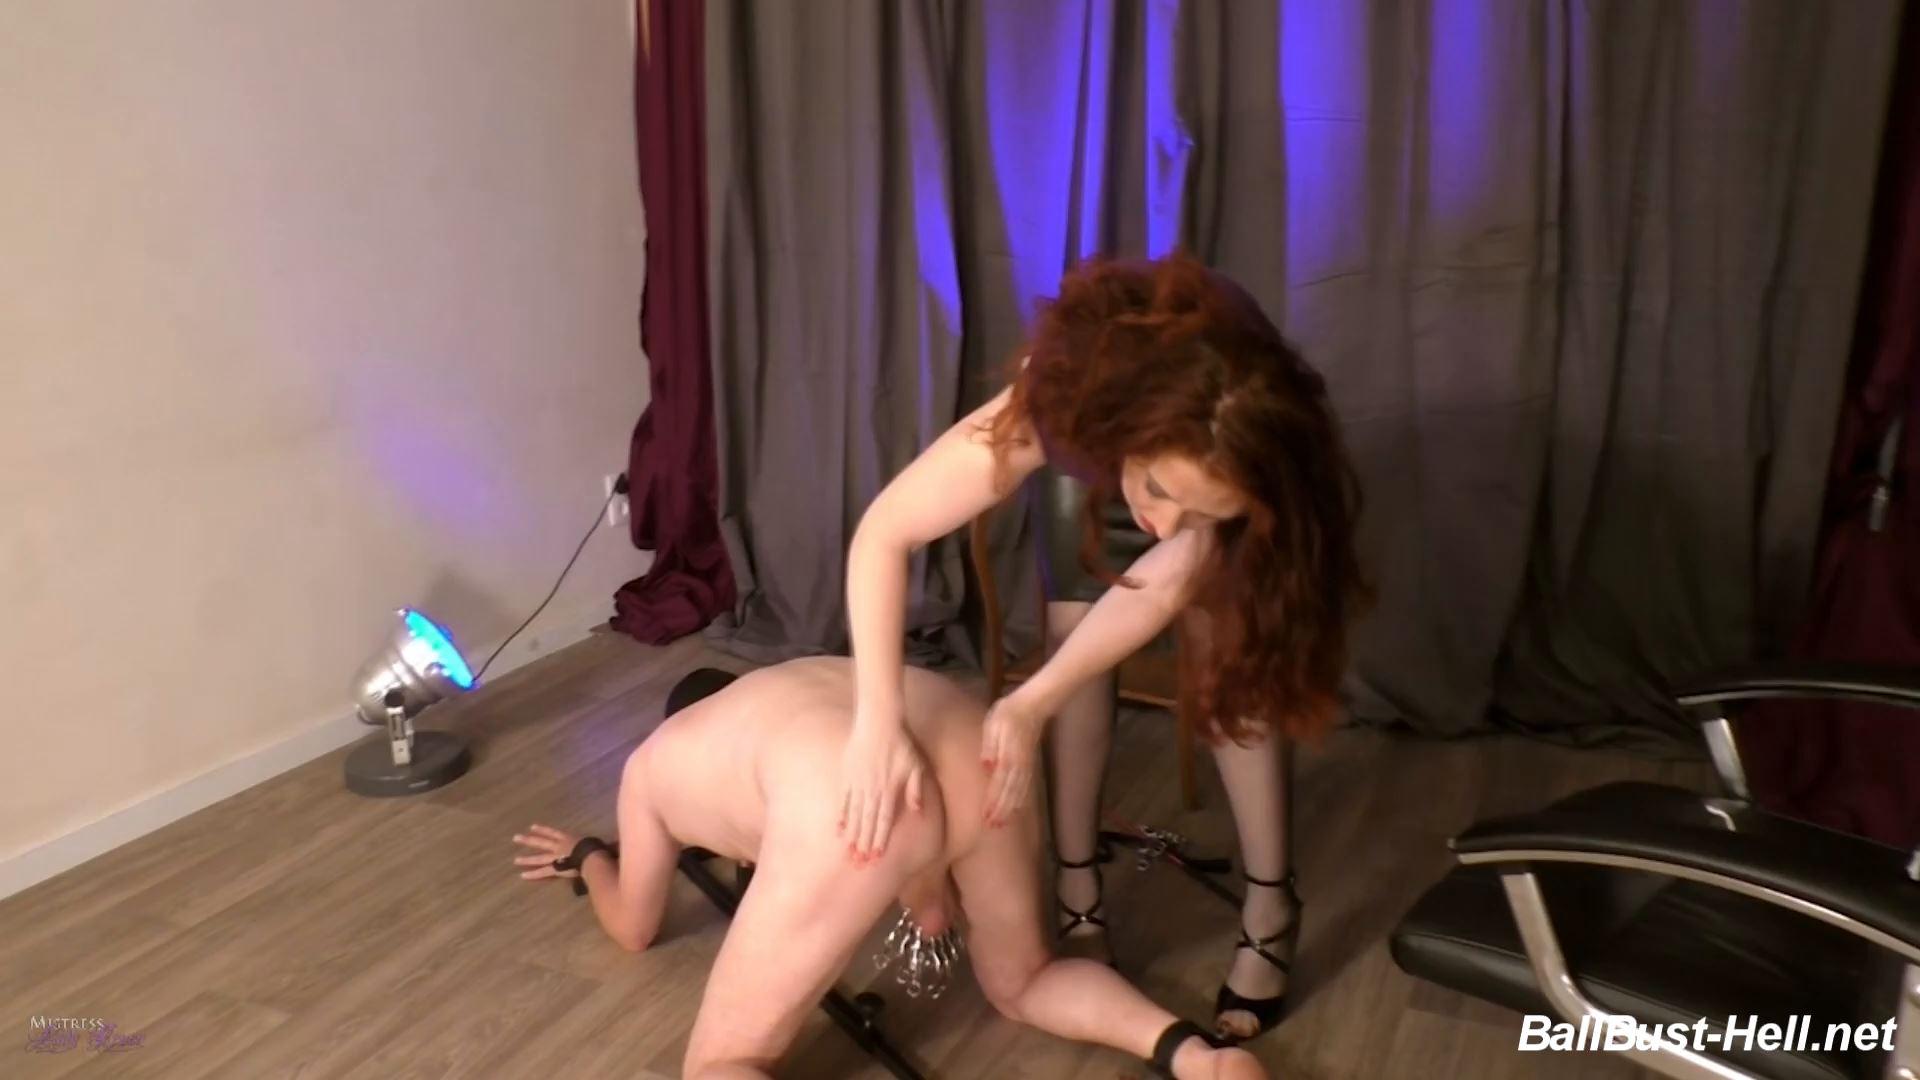 Mistress Lady Renee In Scene: Sack Stimulation - MistressLadyRenee - FULL HD/1080p/MP4